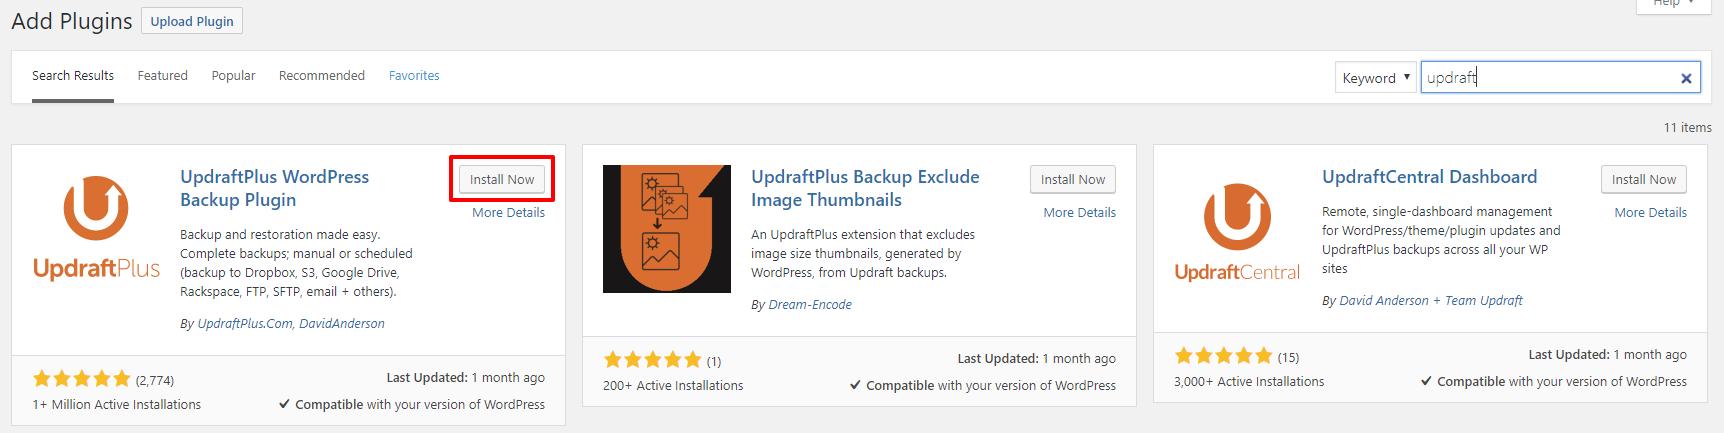 UpdraftPlus plugin | HollyPryce.com